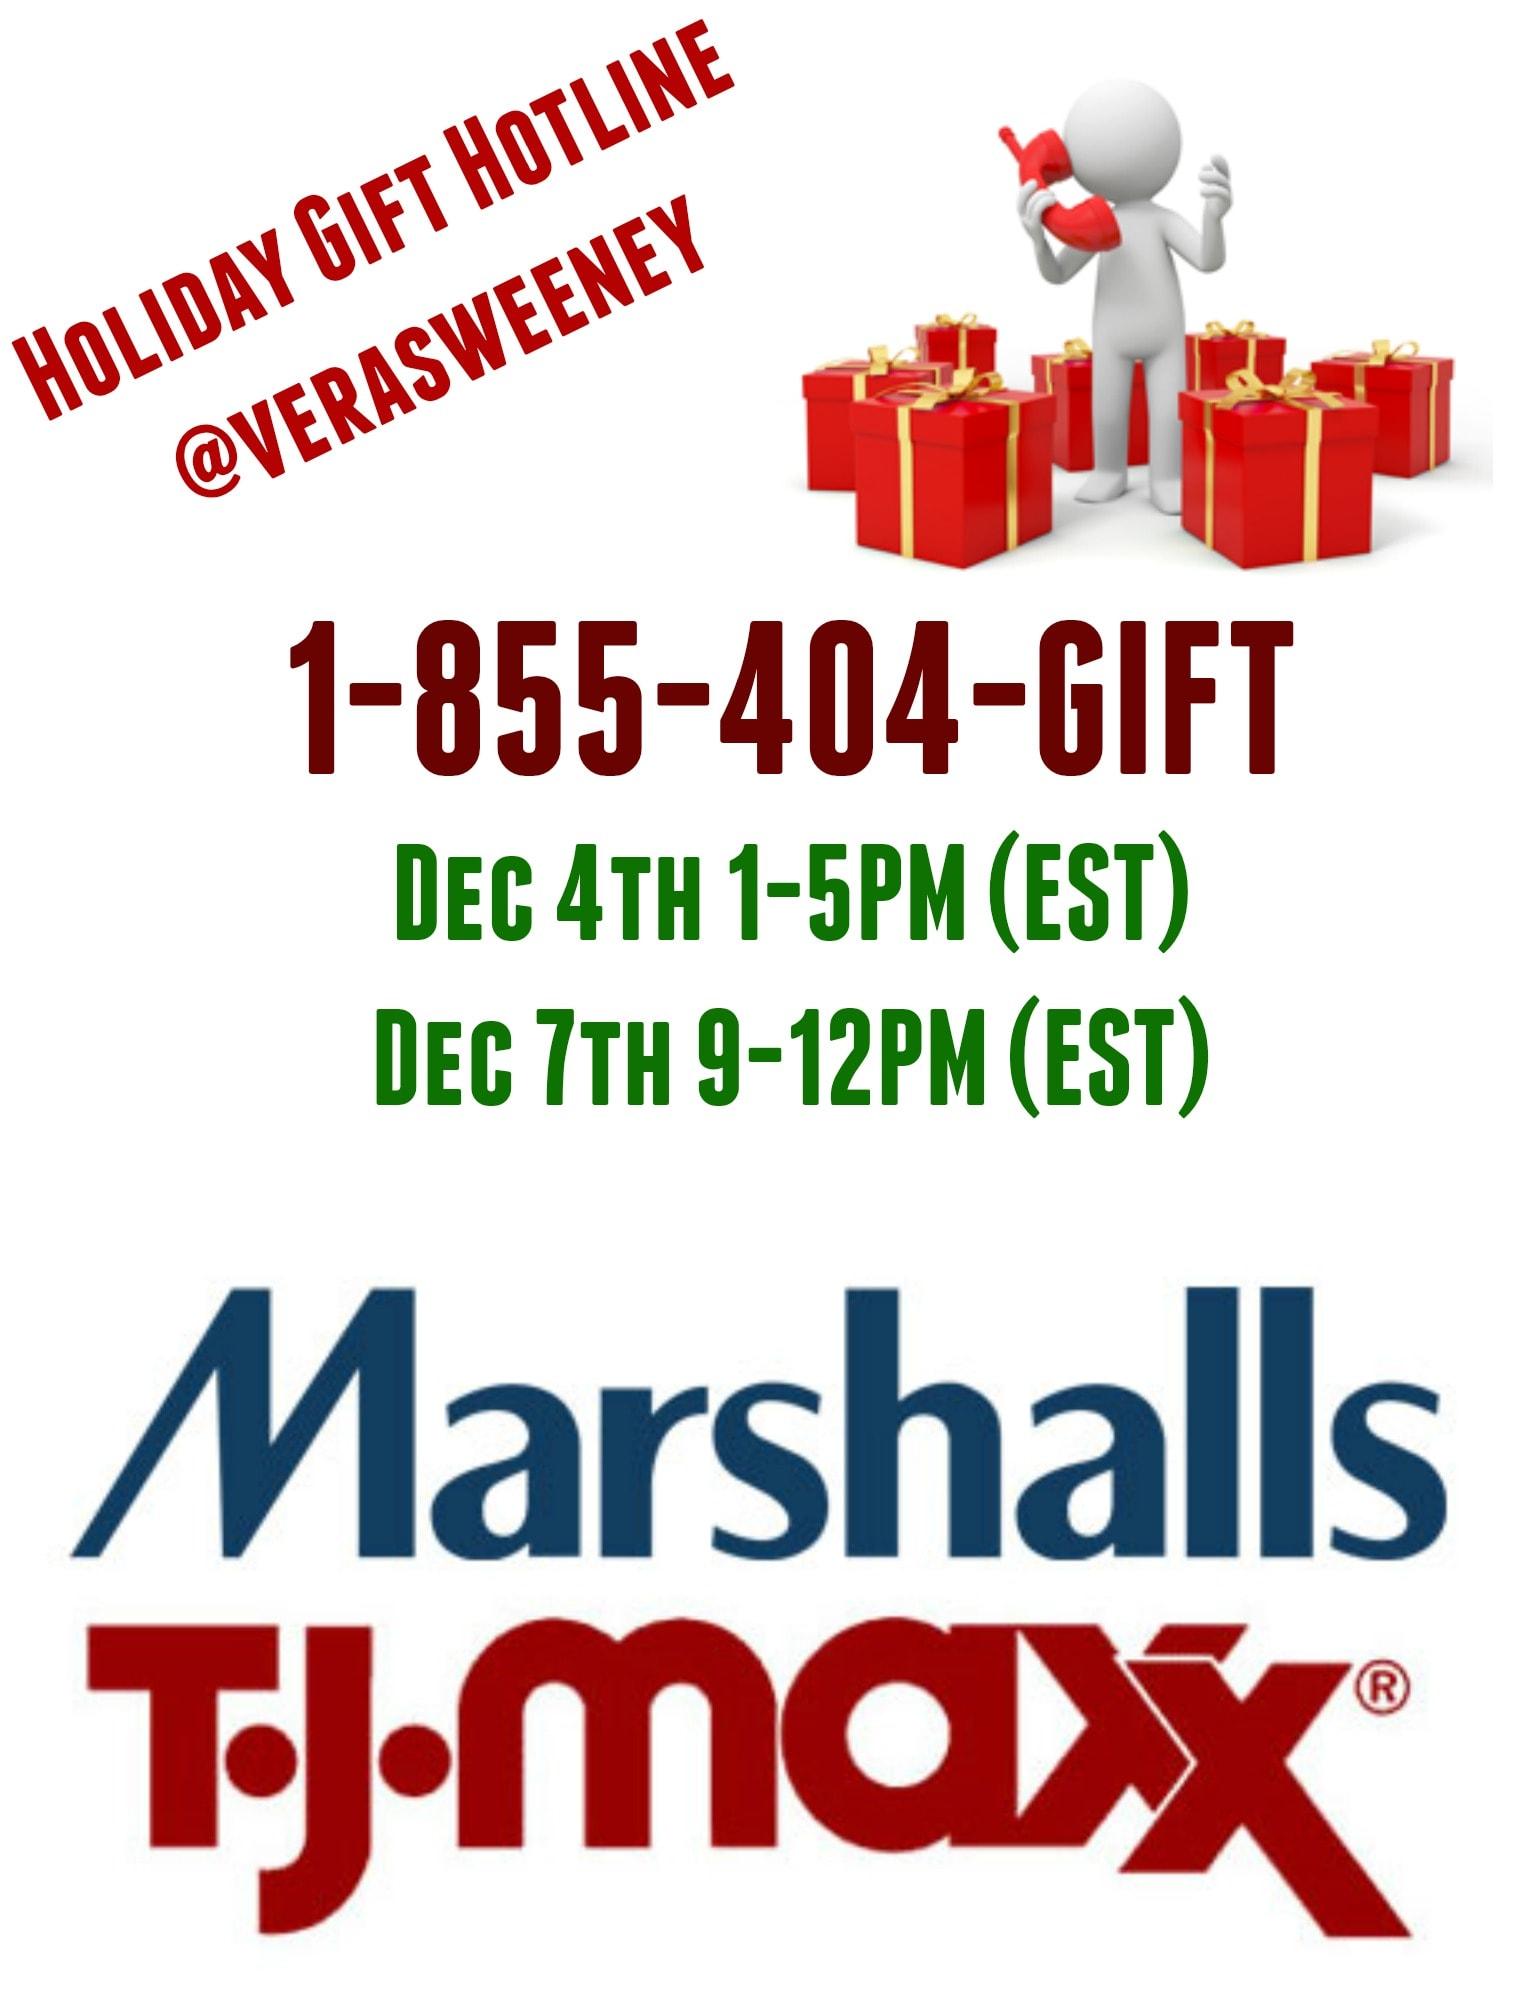 holiday_hotline